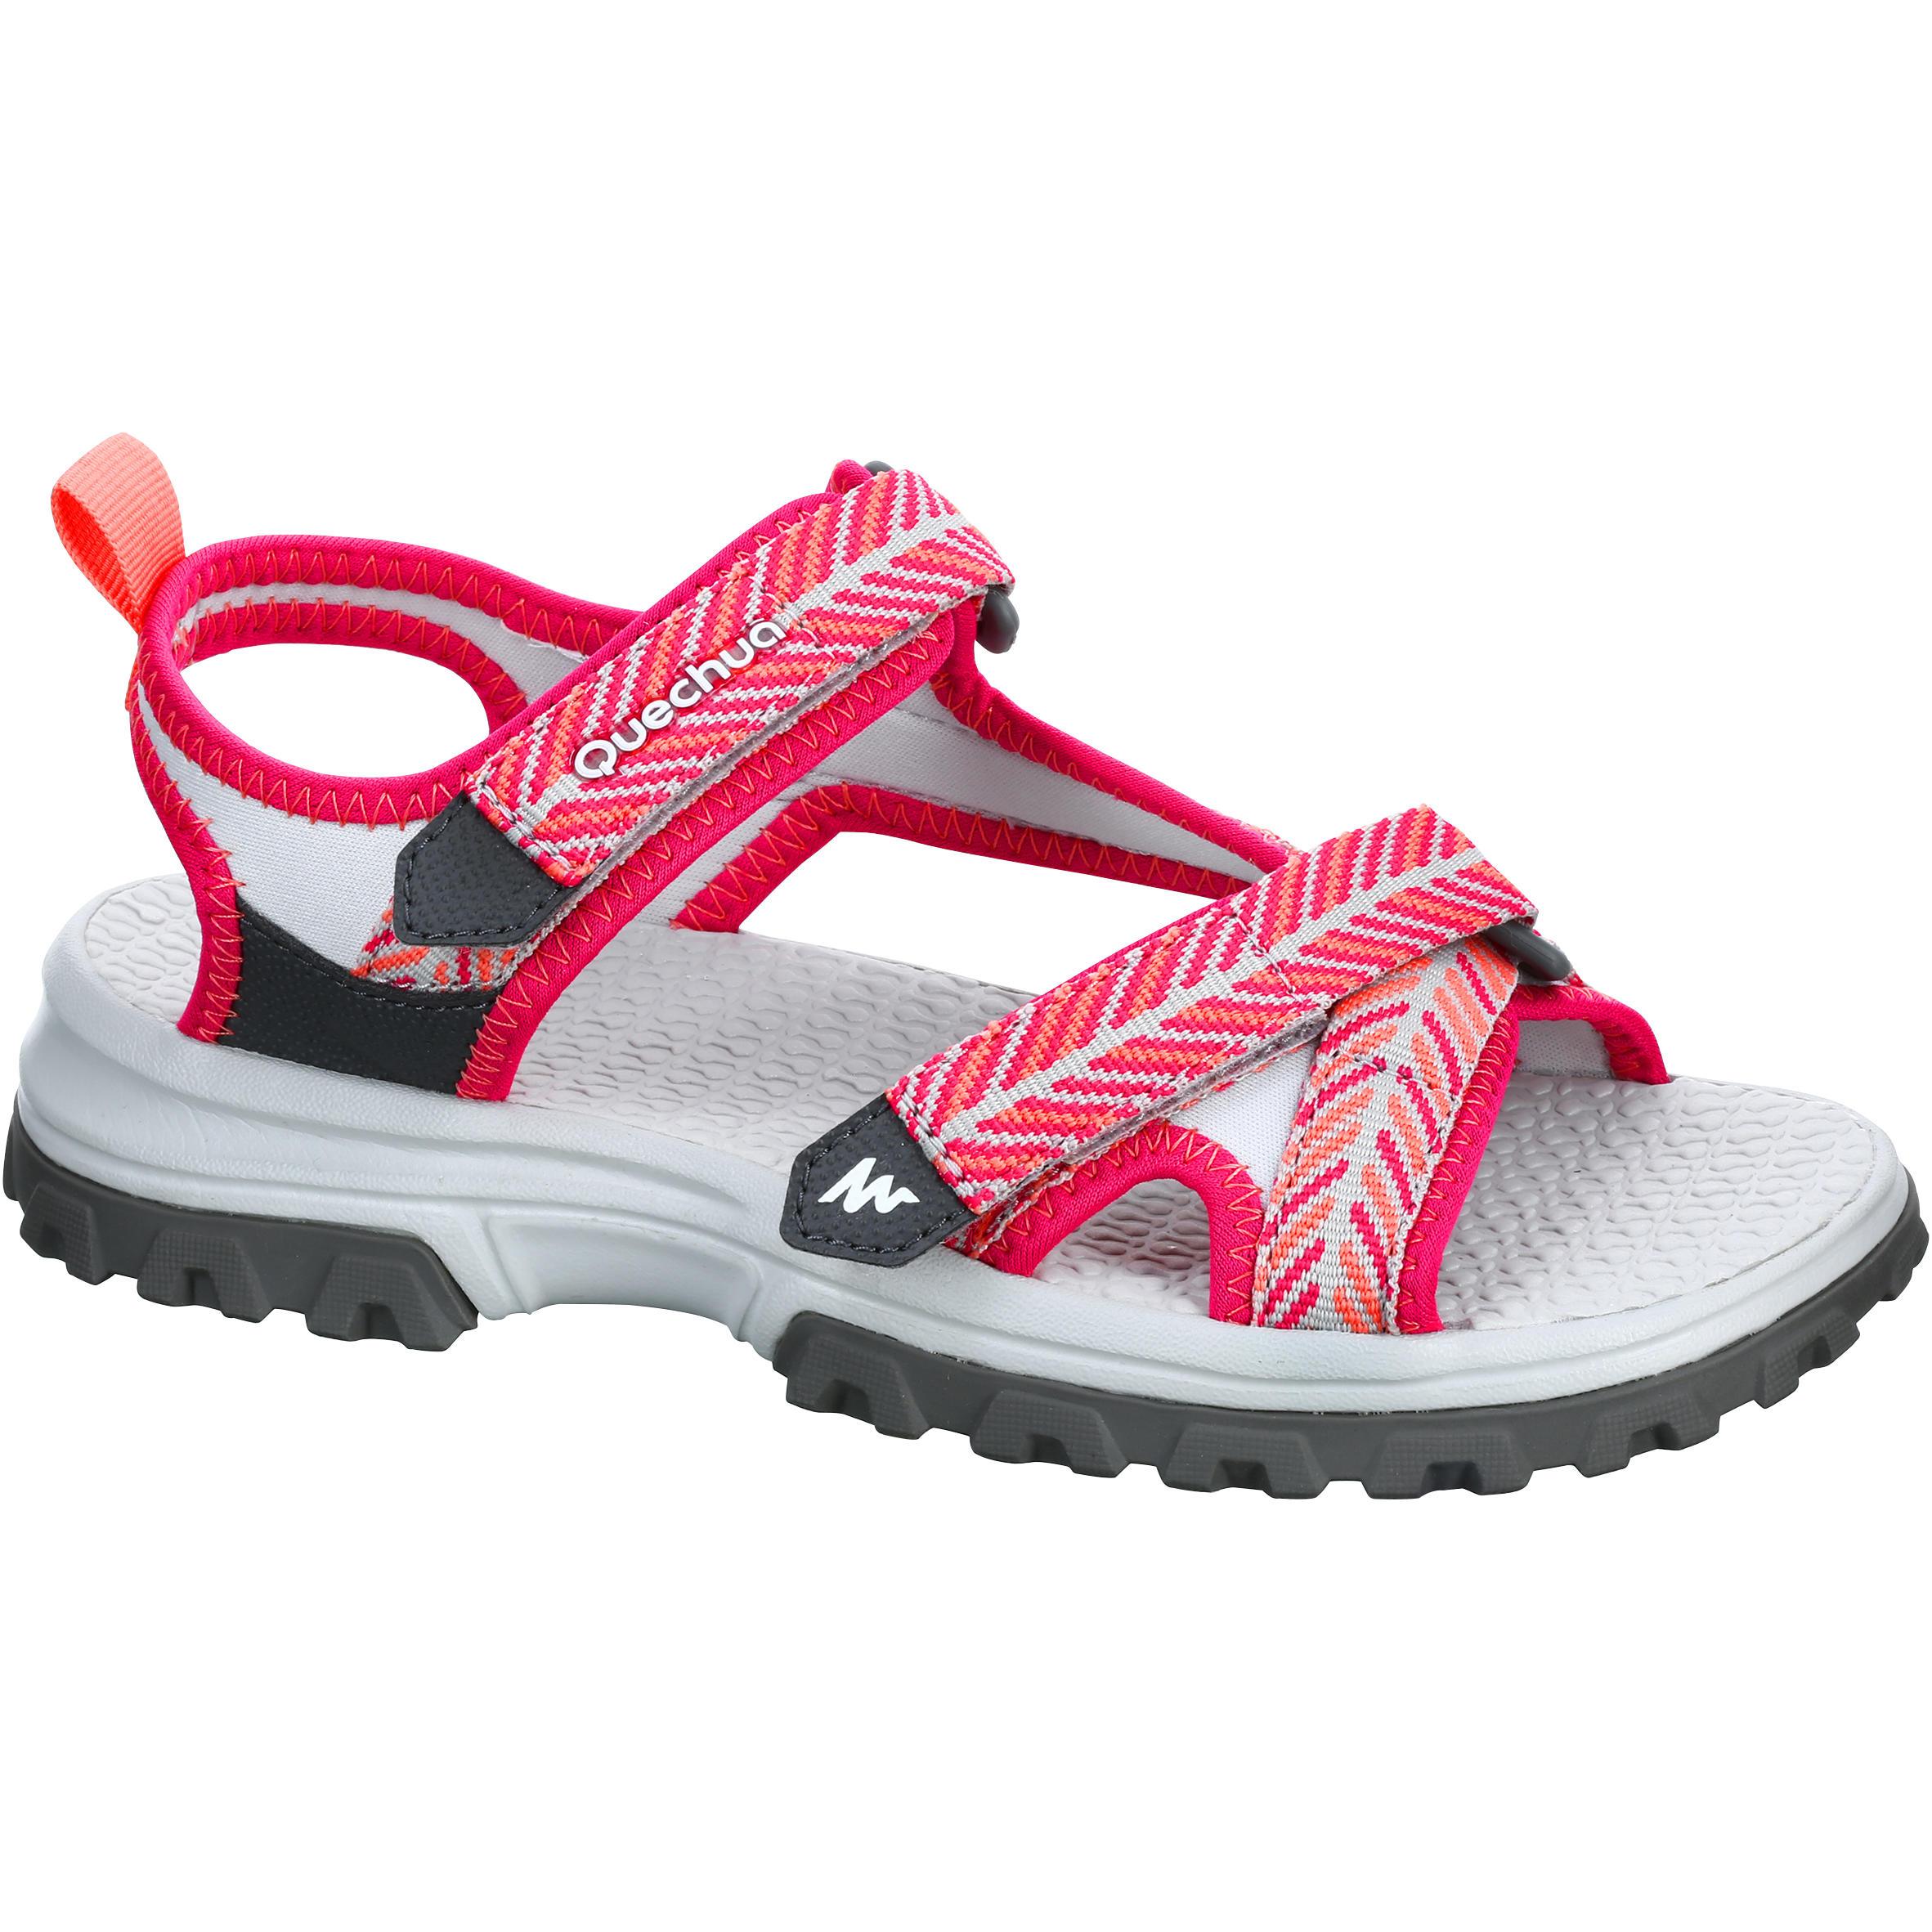 Sandalias de travesía Hike 500 niñas rosa